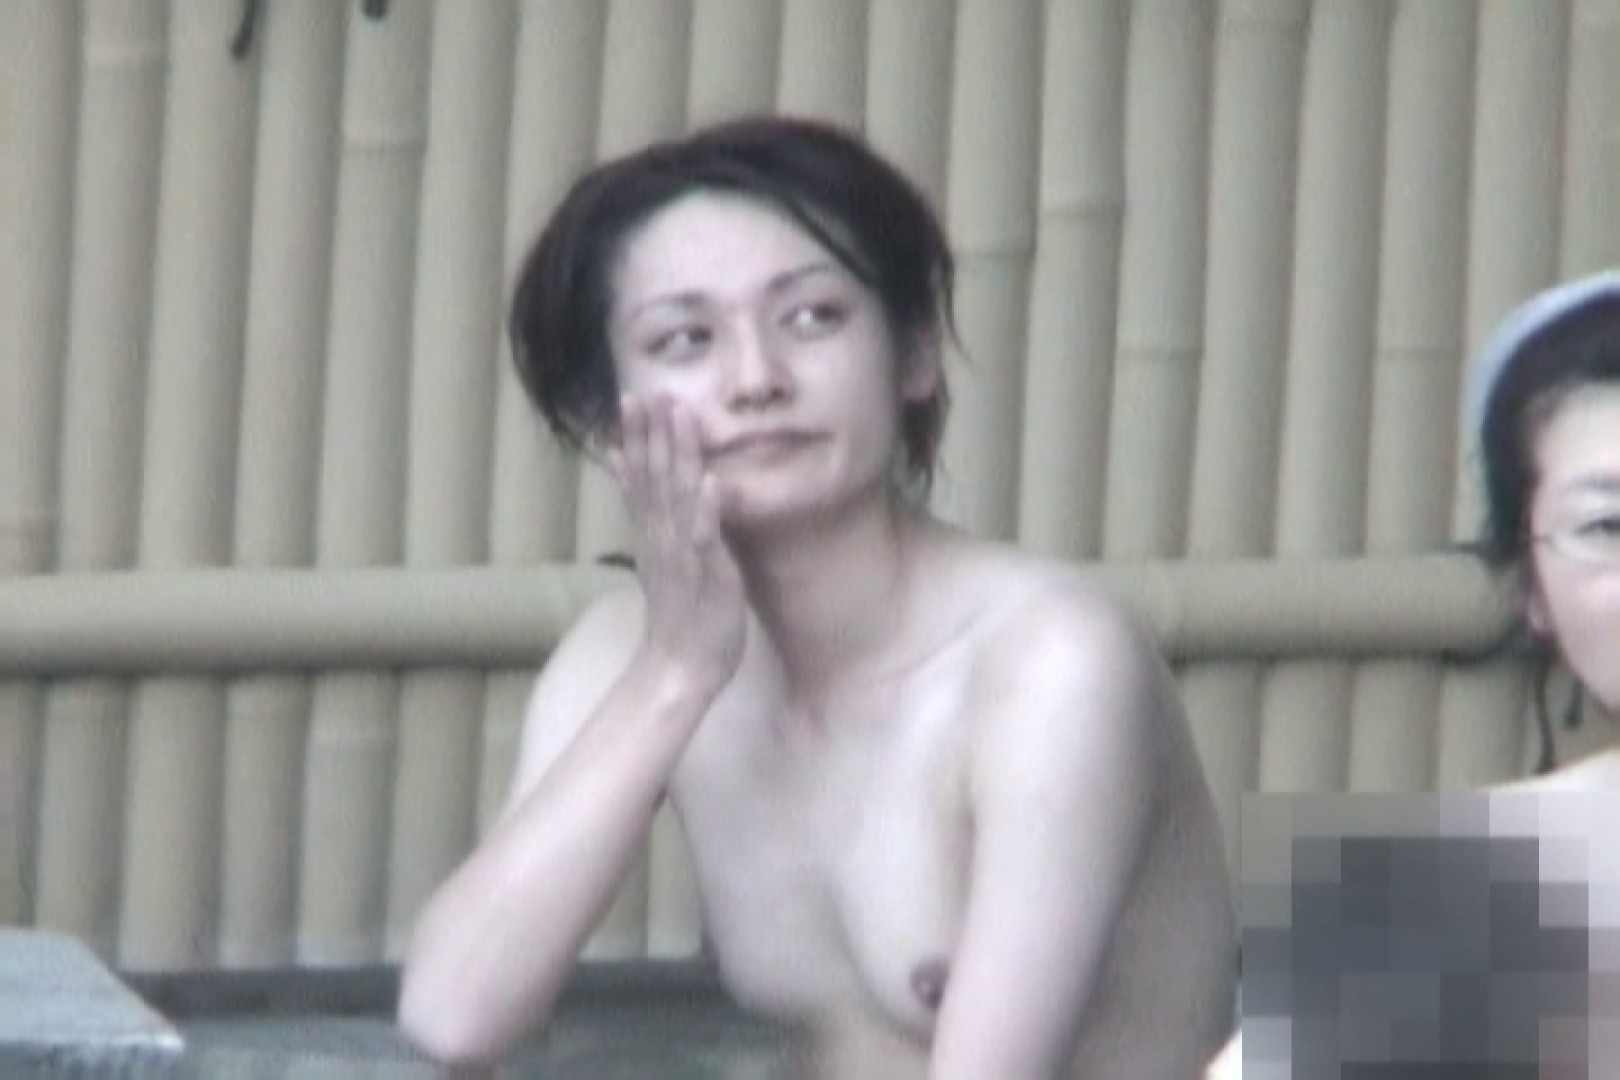 Aquaな露天風呂Vol.839 露天風呂突入 ワレメ動画紹介 96pic 86